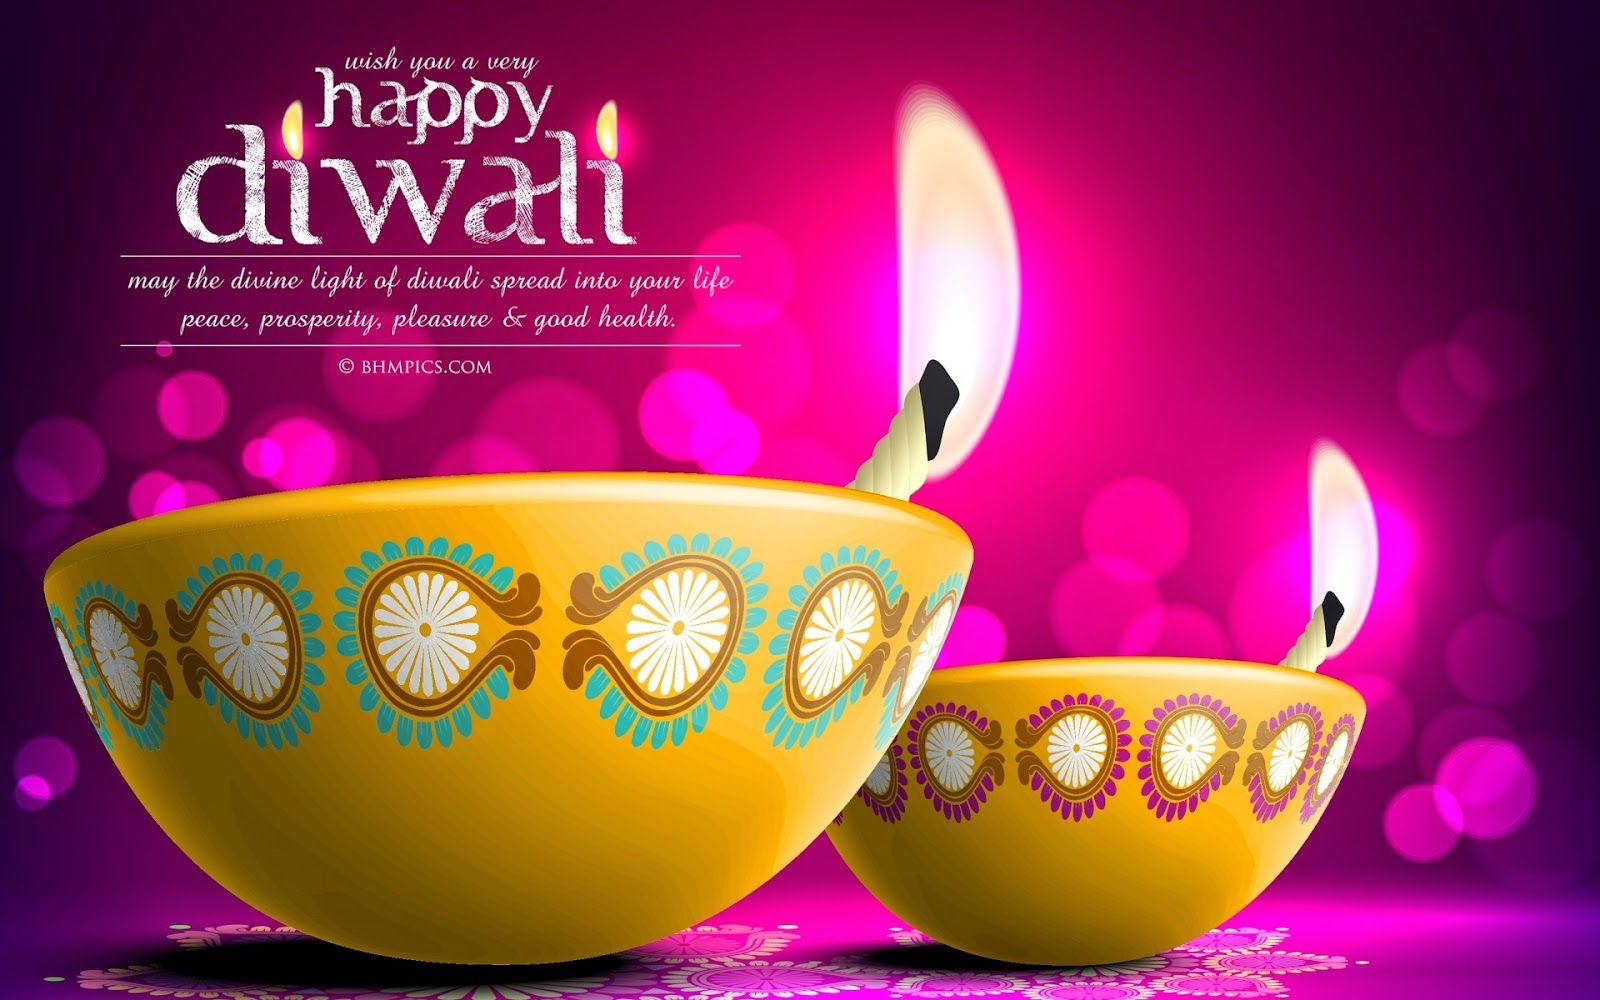 Happy Diwali Hd Wallpapers For Desktop And Mobile Phones D